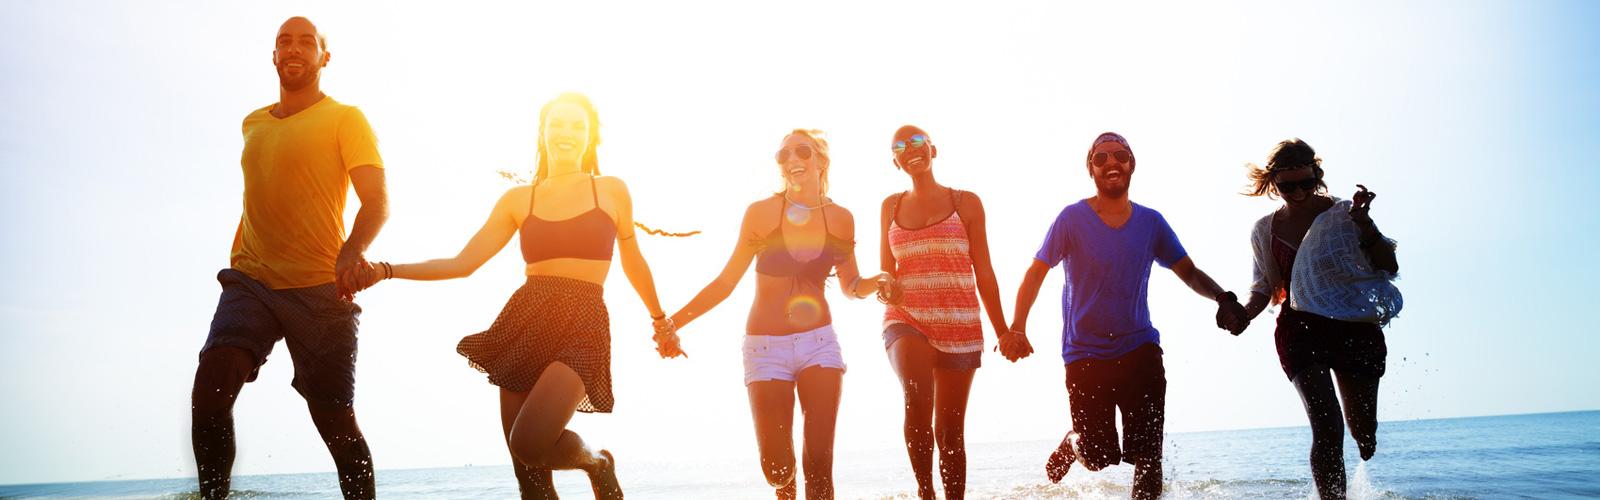 Freunde rennen am Strand